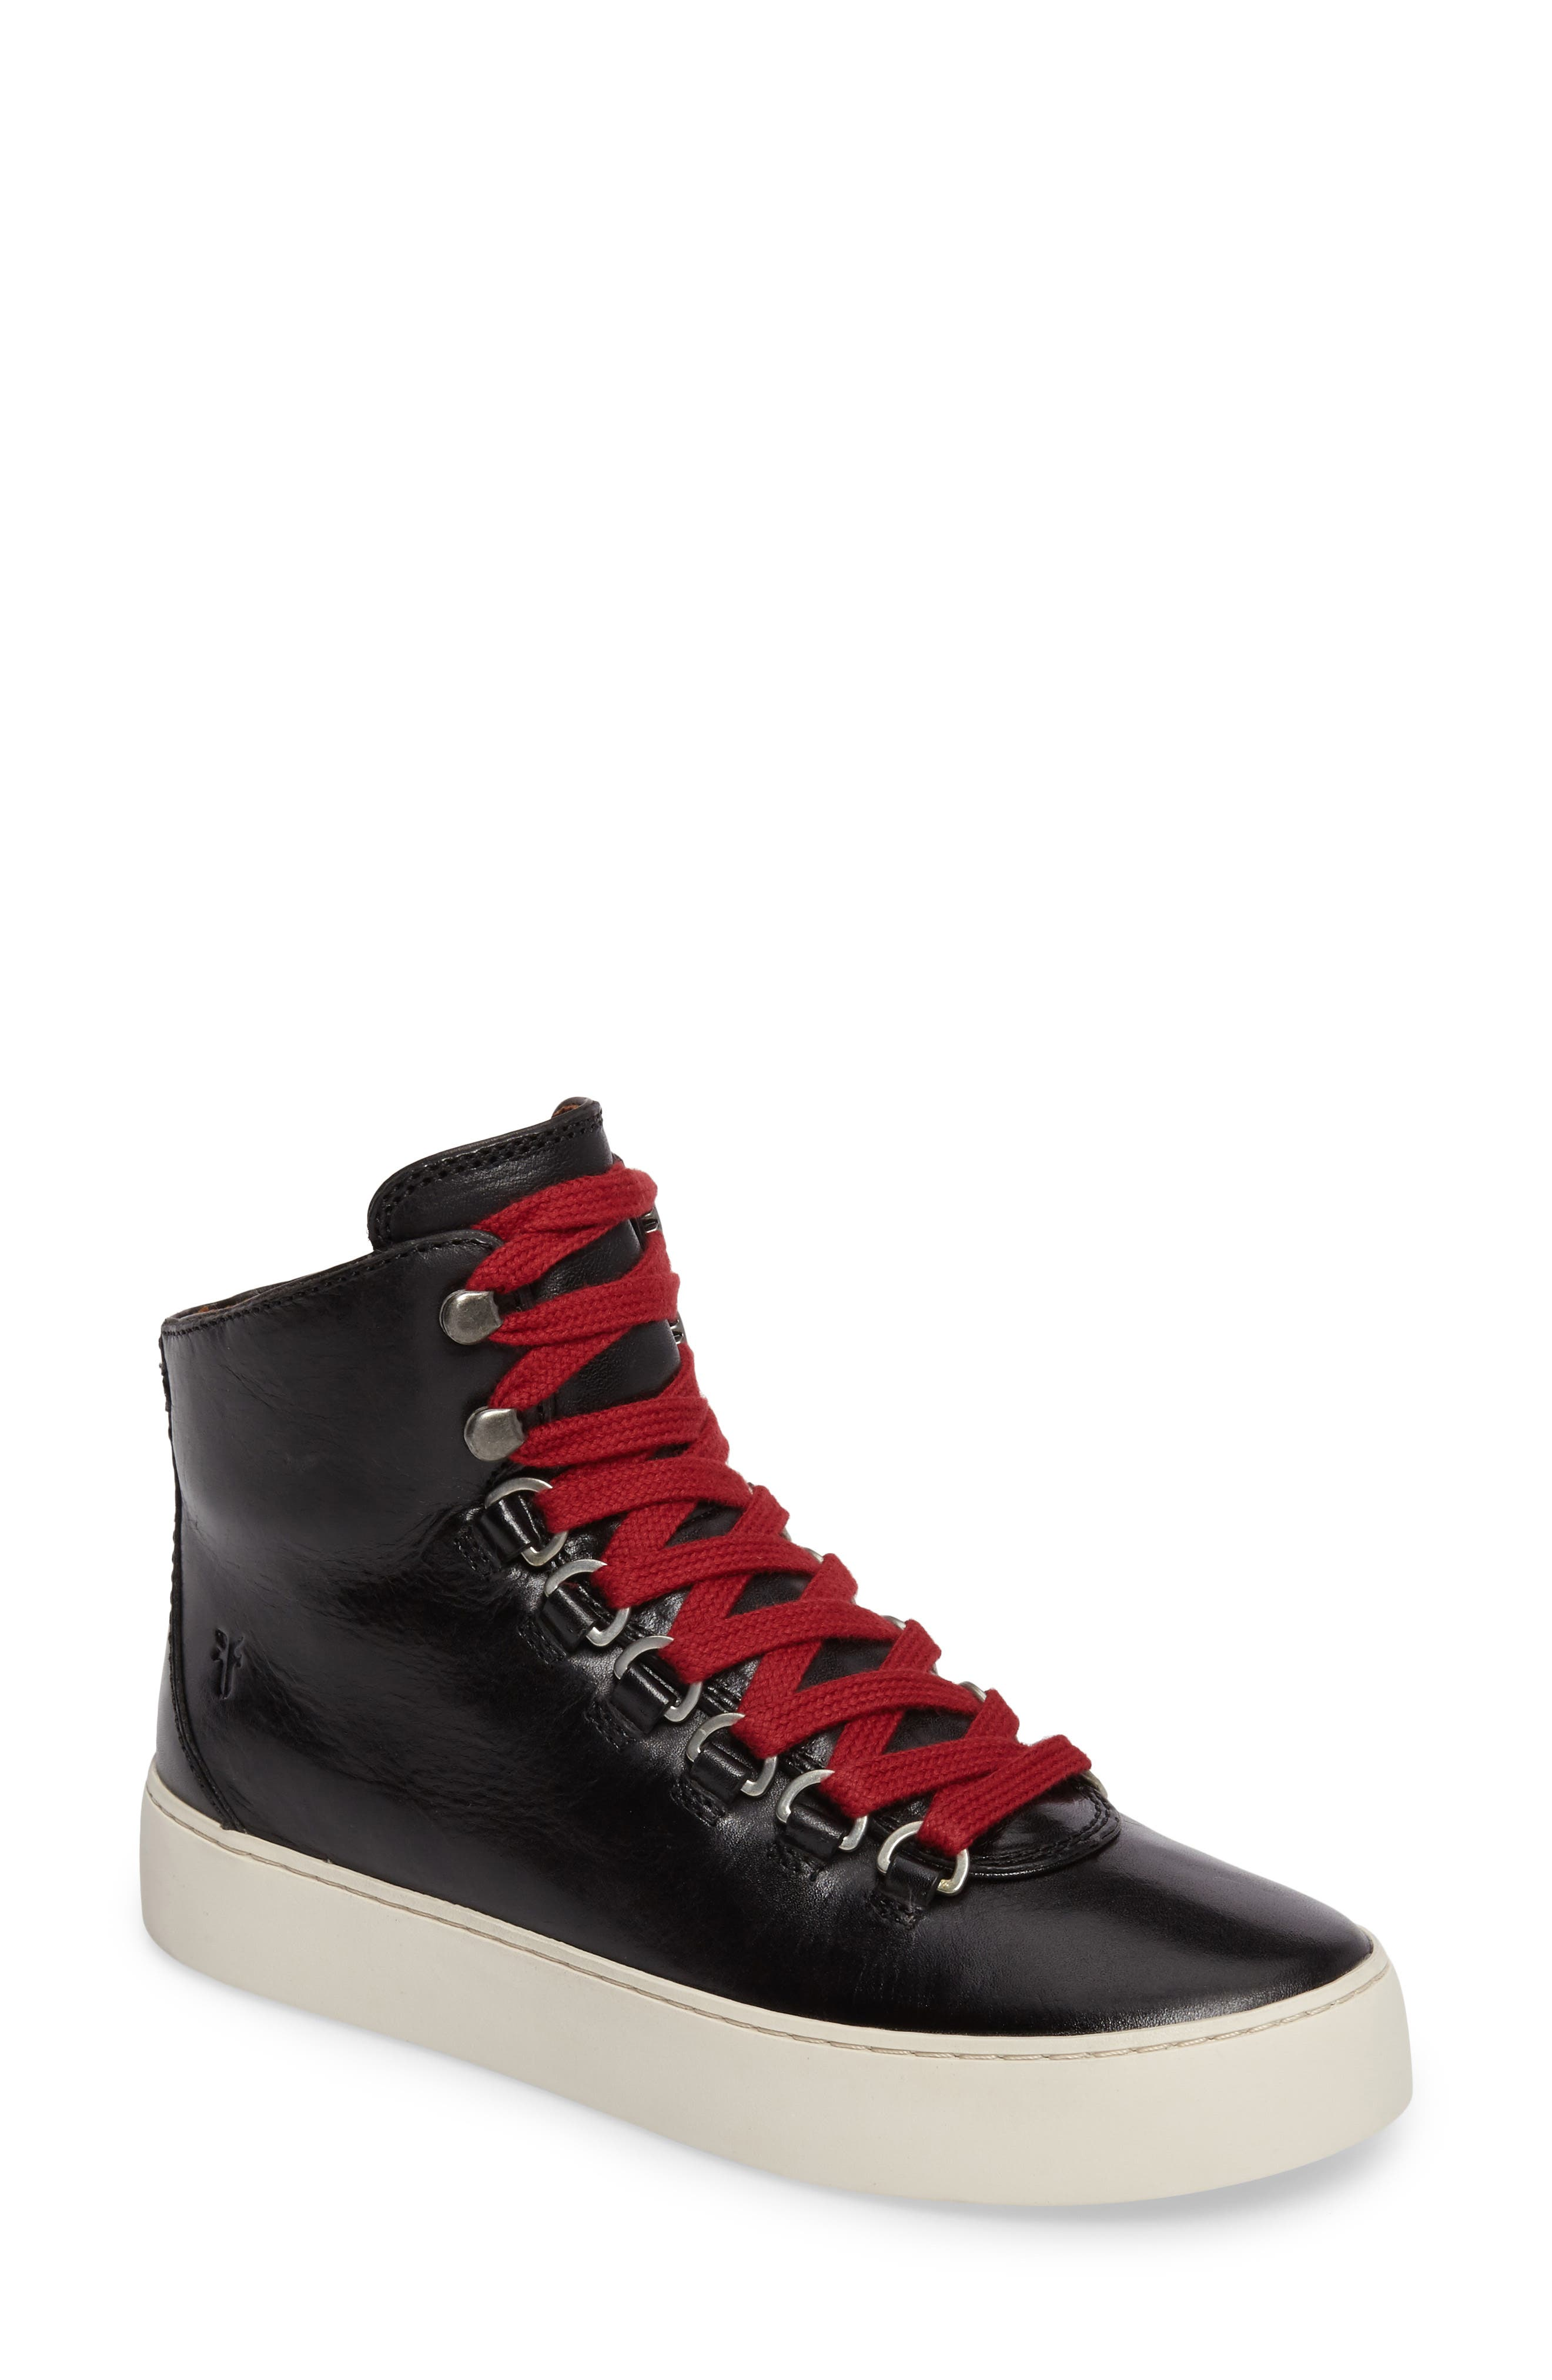 Frye Lena Hiker High Top Sneaker (Women)